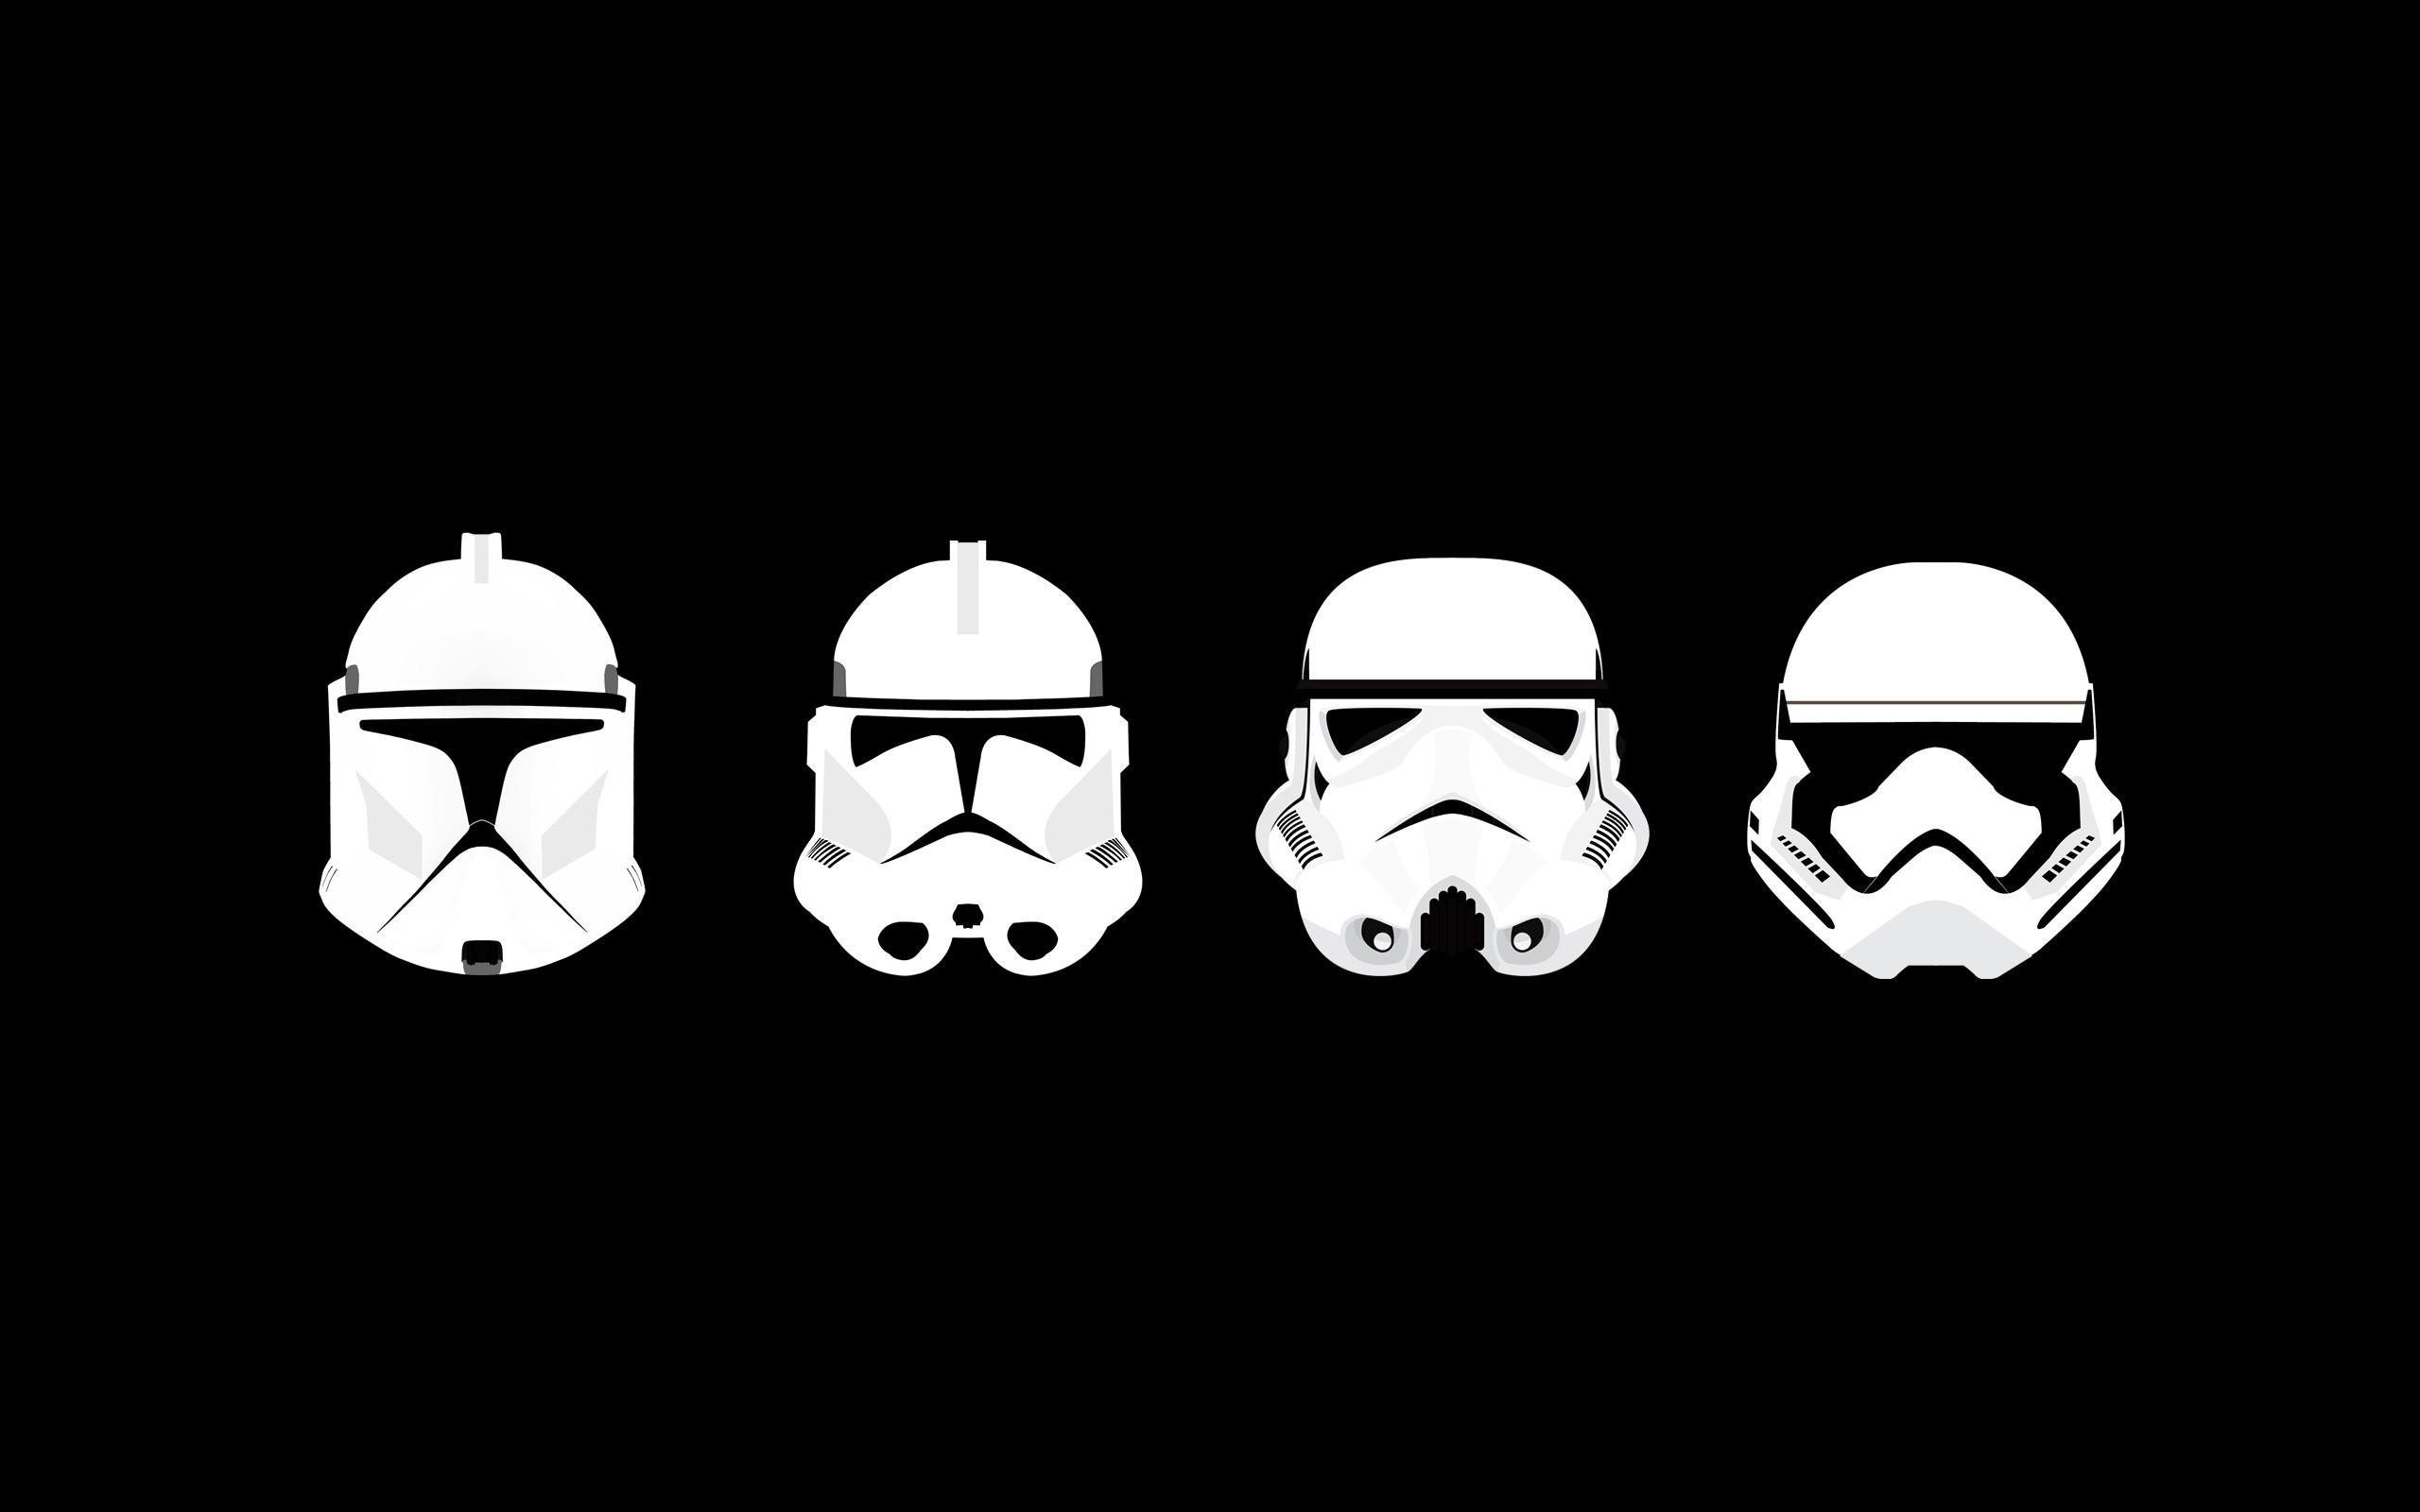 Res: 2560x1600, Star Wars Stormtrooper Wallpaper Hd Pics Clone Trooper Minimalism Of Laptop